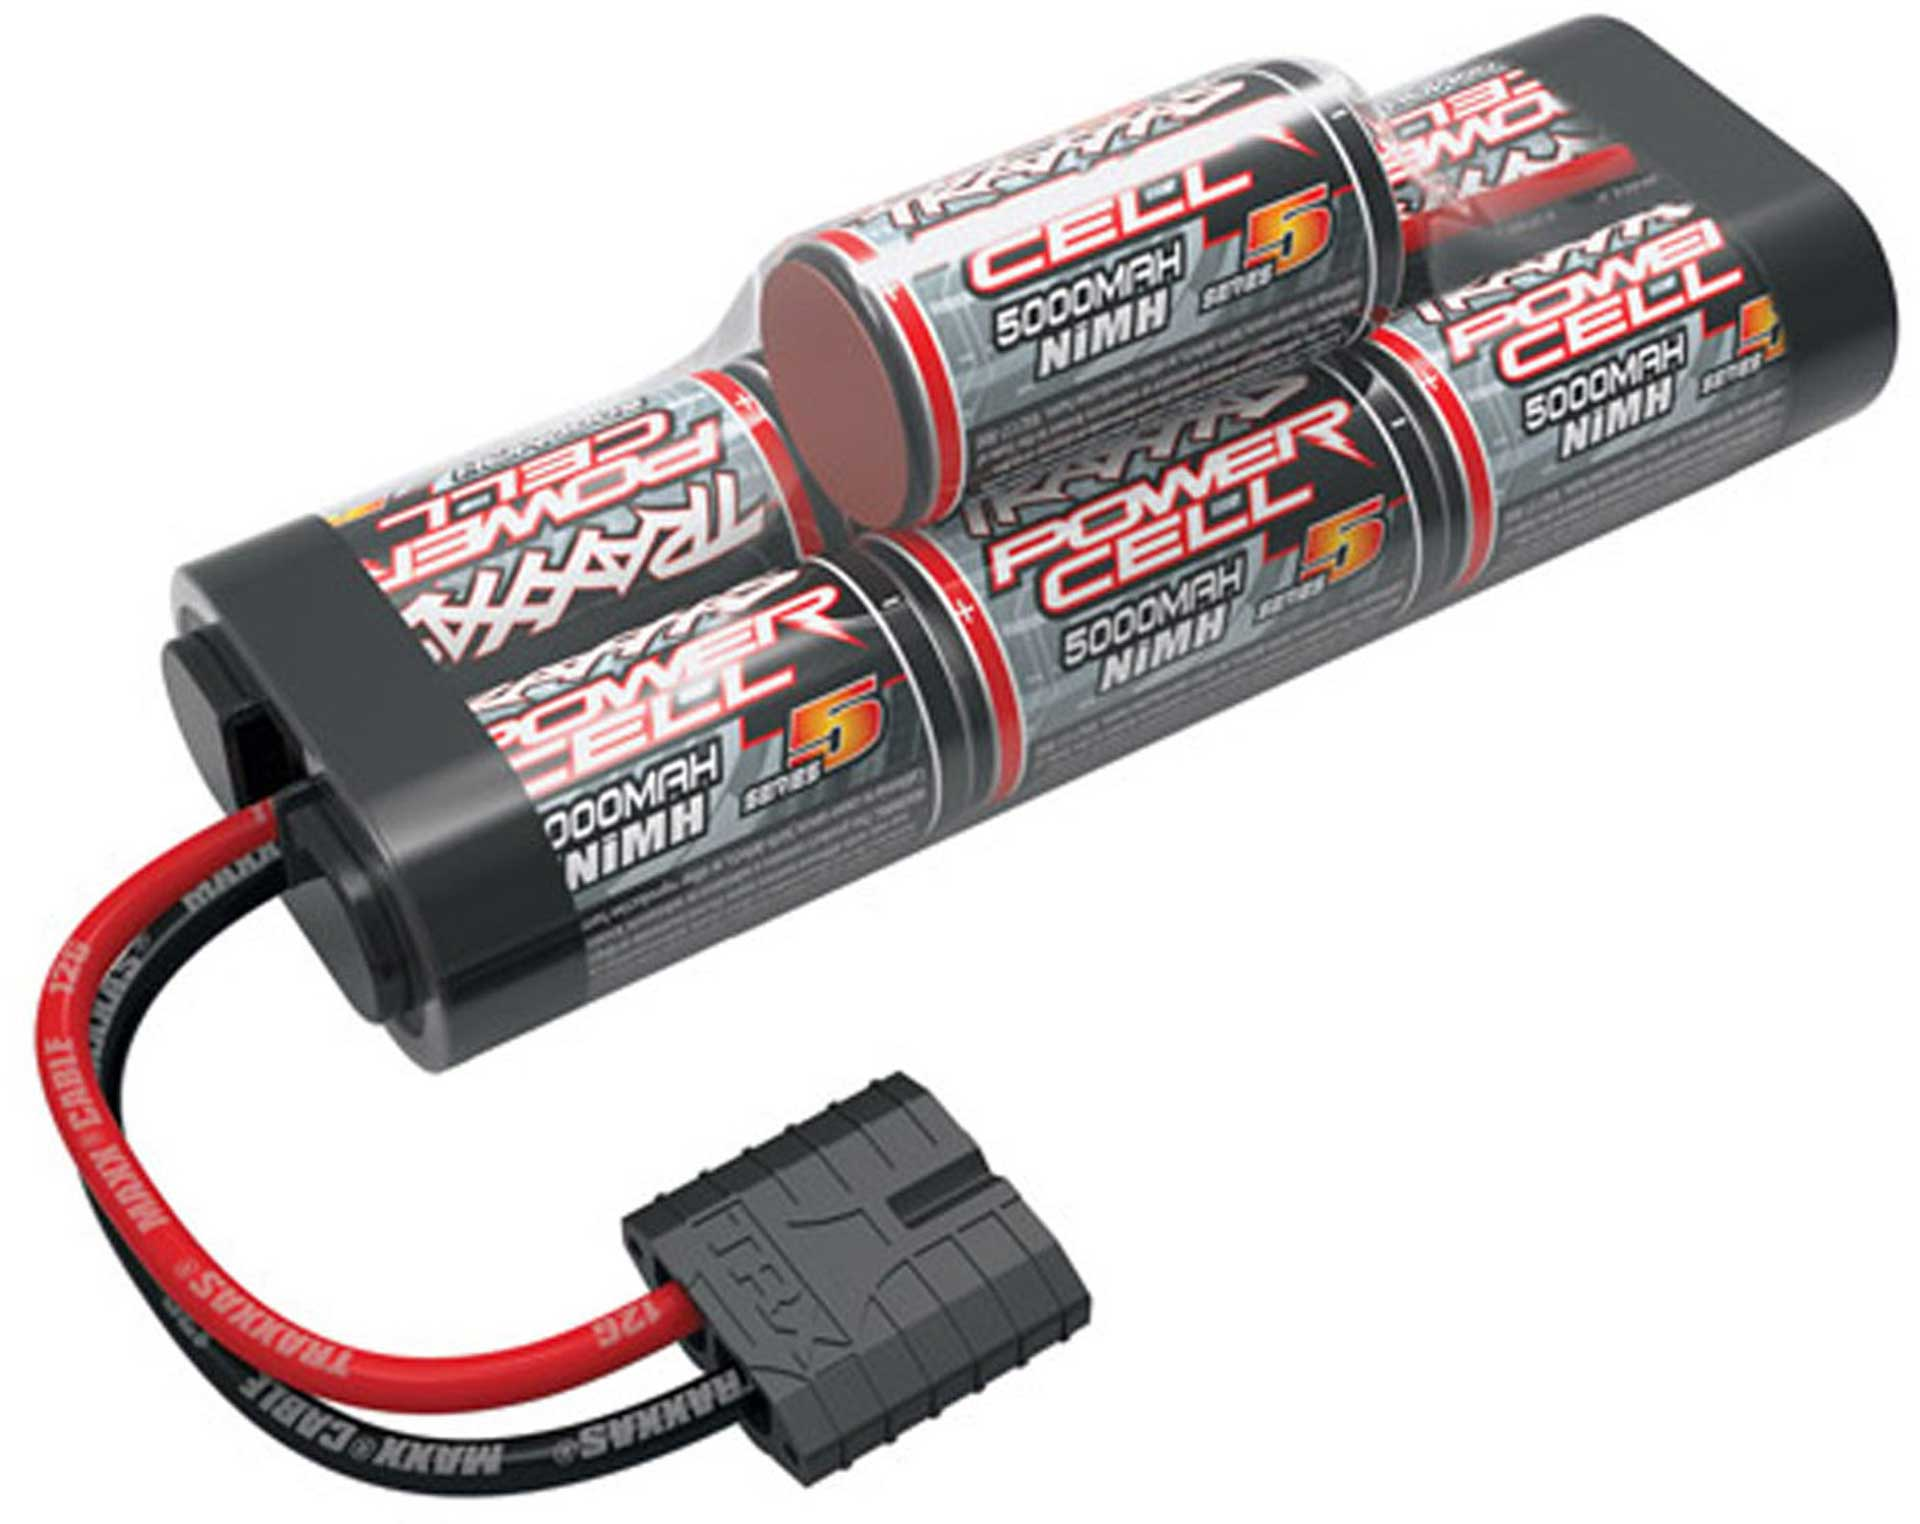 TRAXXAS Power Cell Series5 8,4V 5000mAh